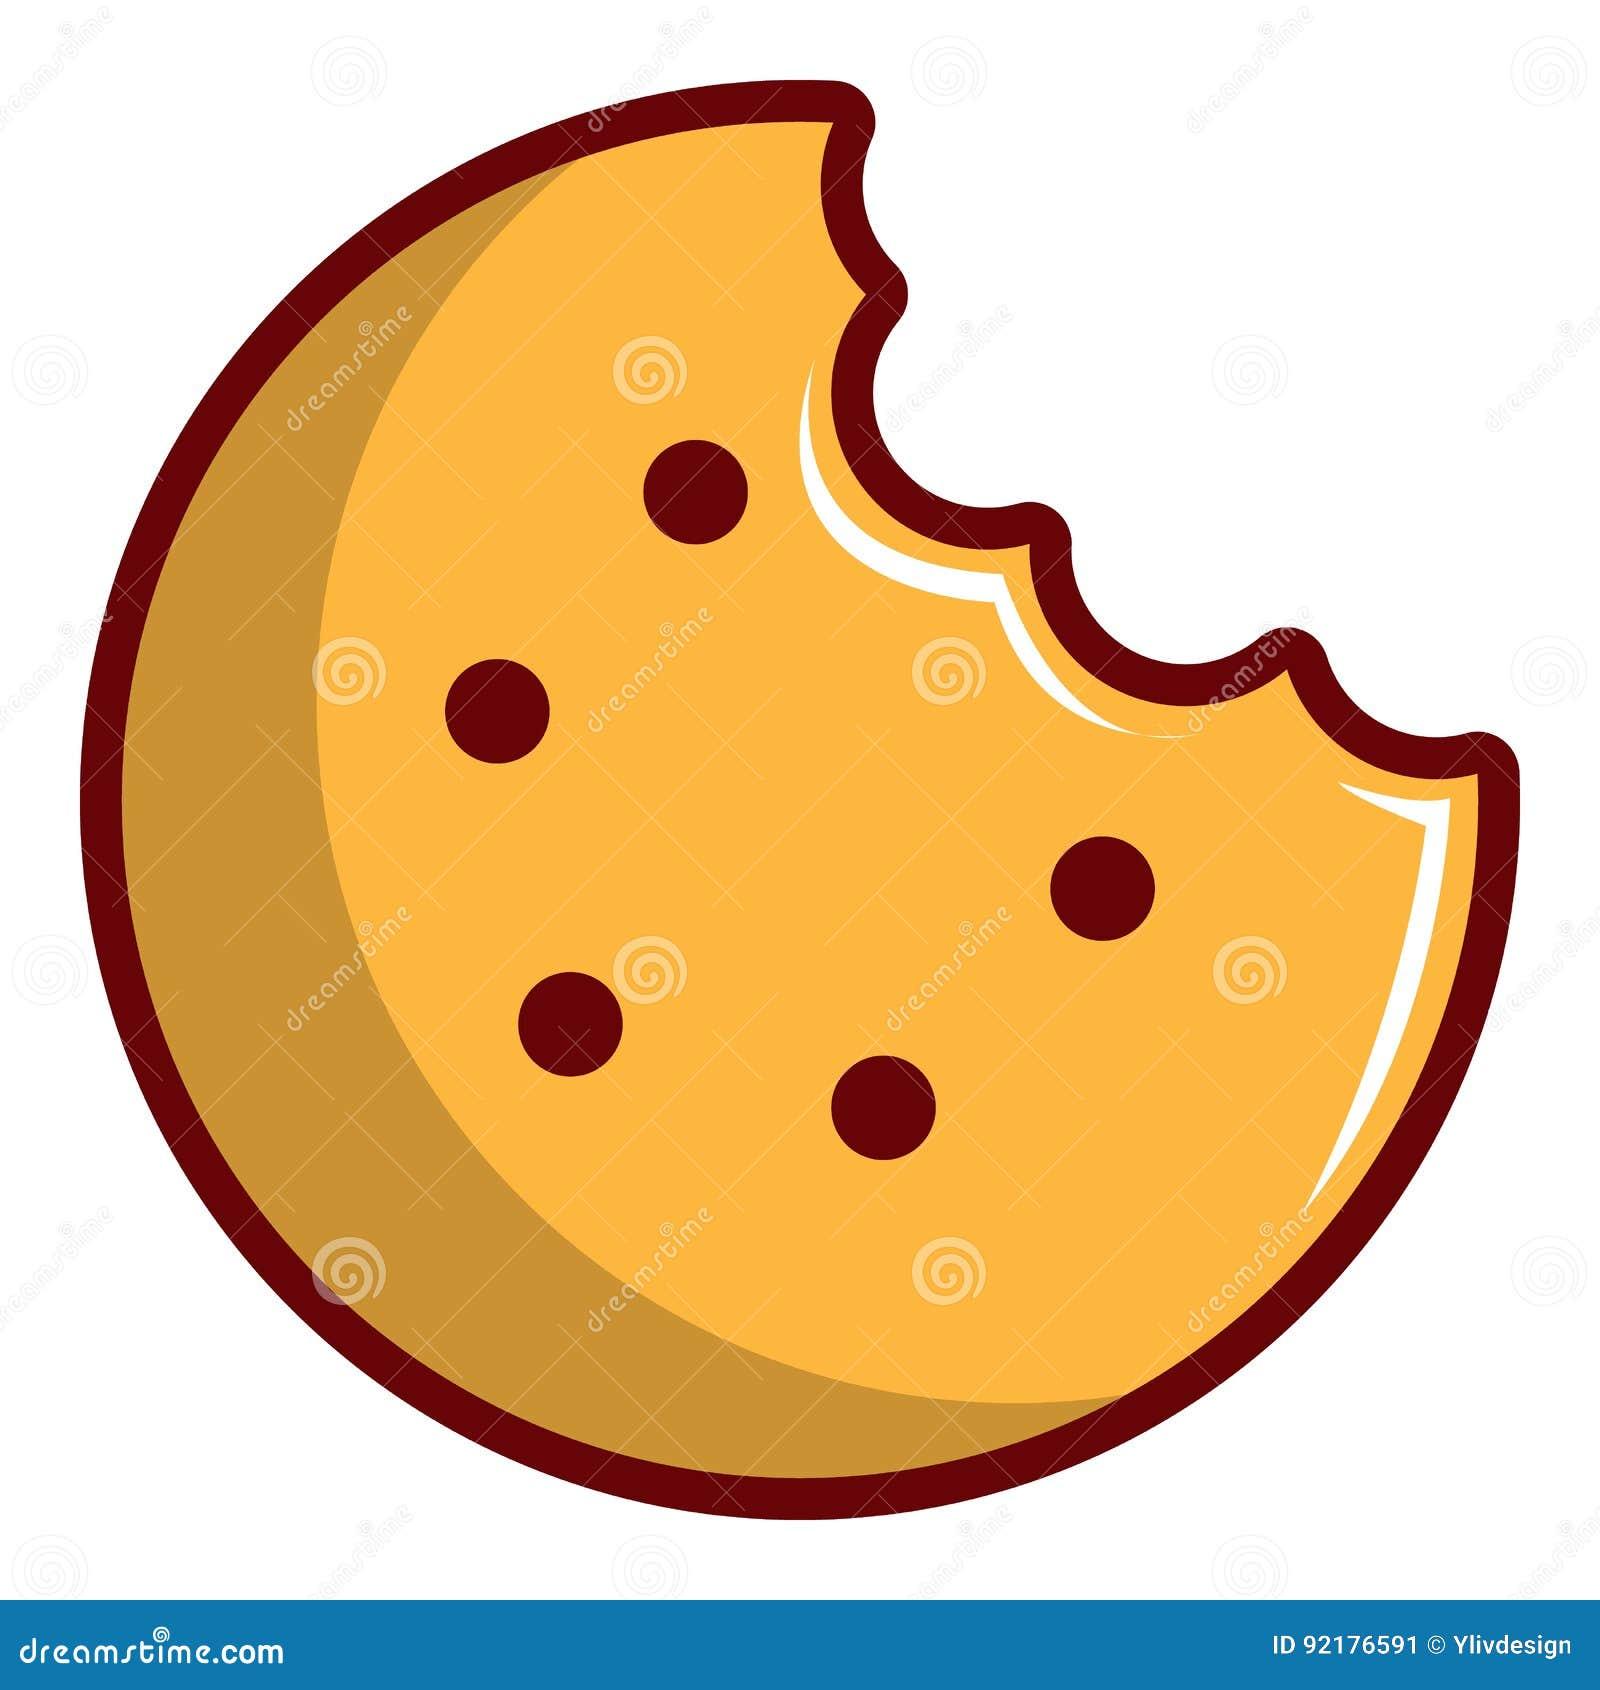 Bitten Round Cookie Icon Cartoon Style Stock Vector